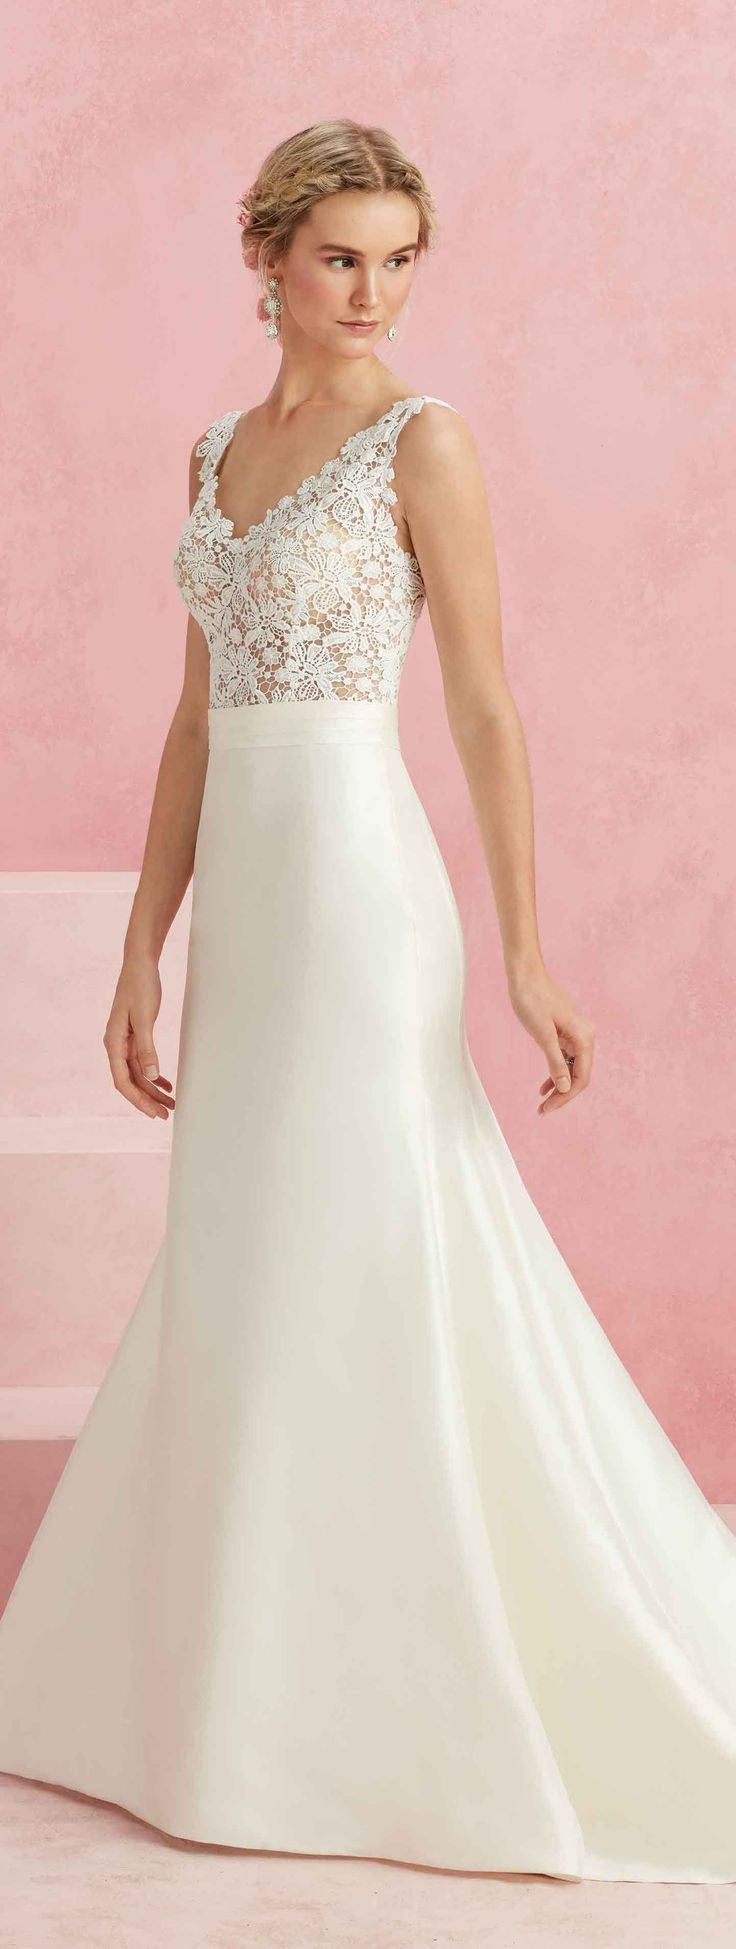 Mejores 1615 imágenes de Wedding Dresses Corset en Pinterest ...